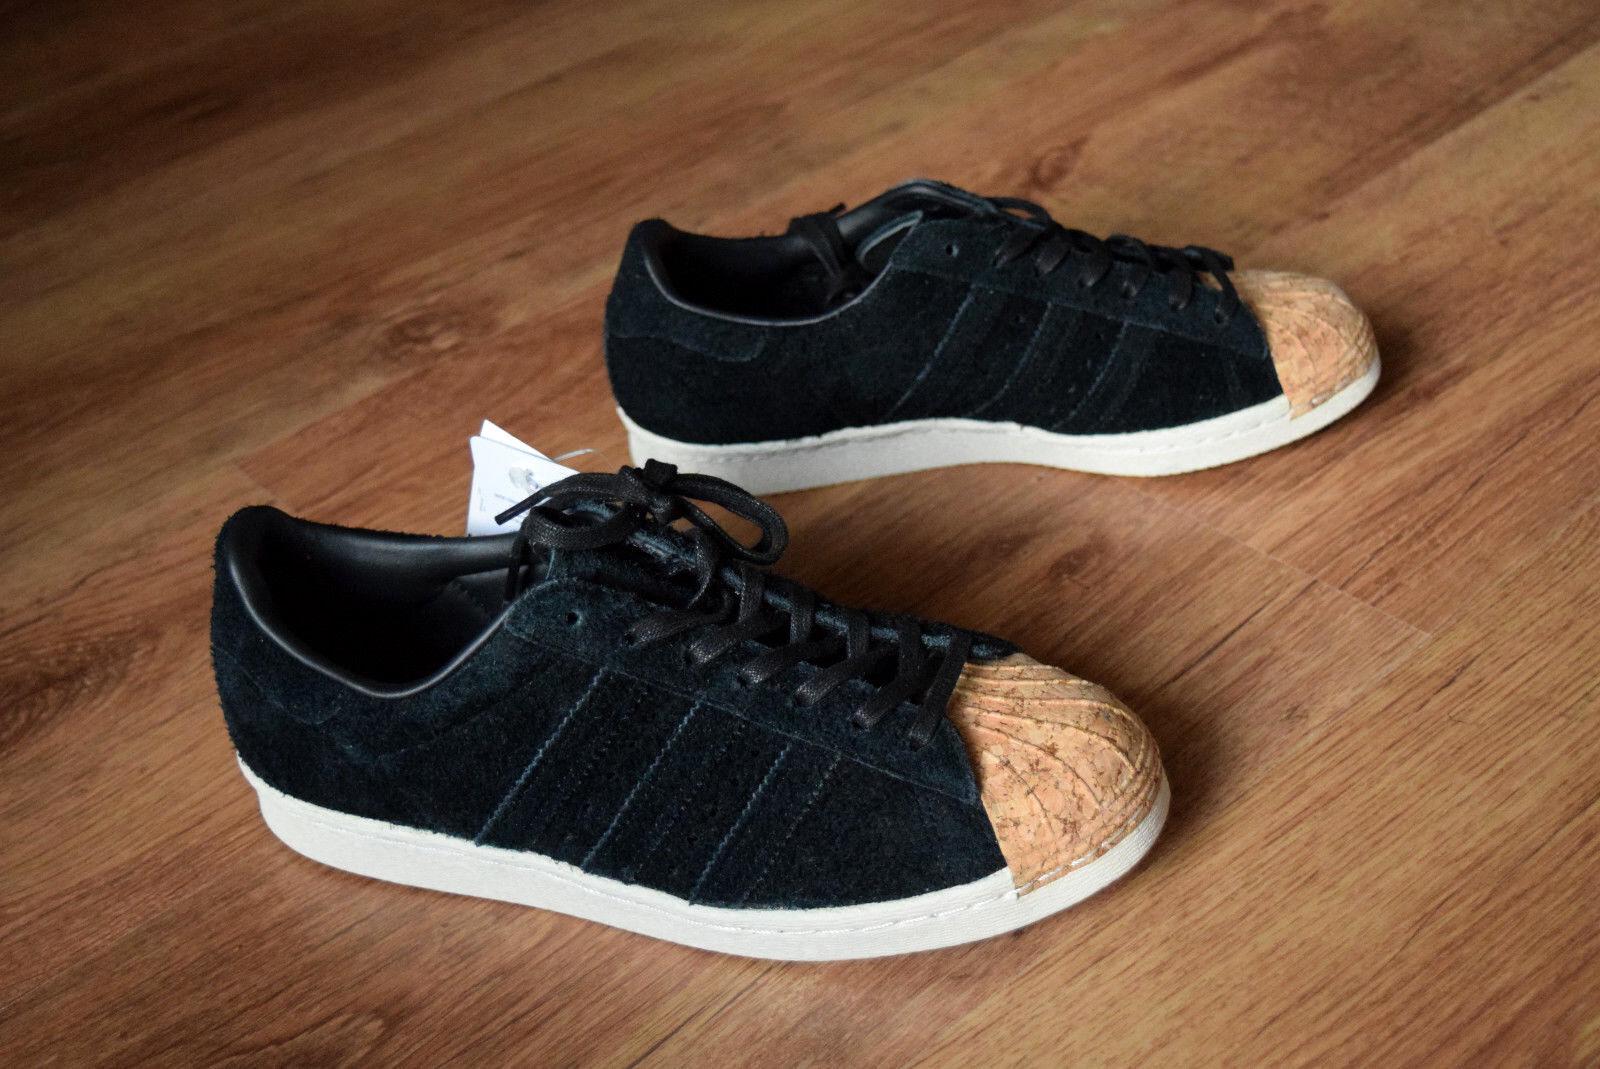 Adidas Superstar Cork W 36 37 38 39 39 39 40 41 42 by2963 gacela Stan Smith metal Toe  caliente